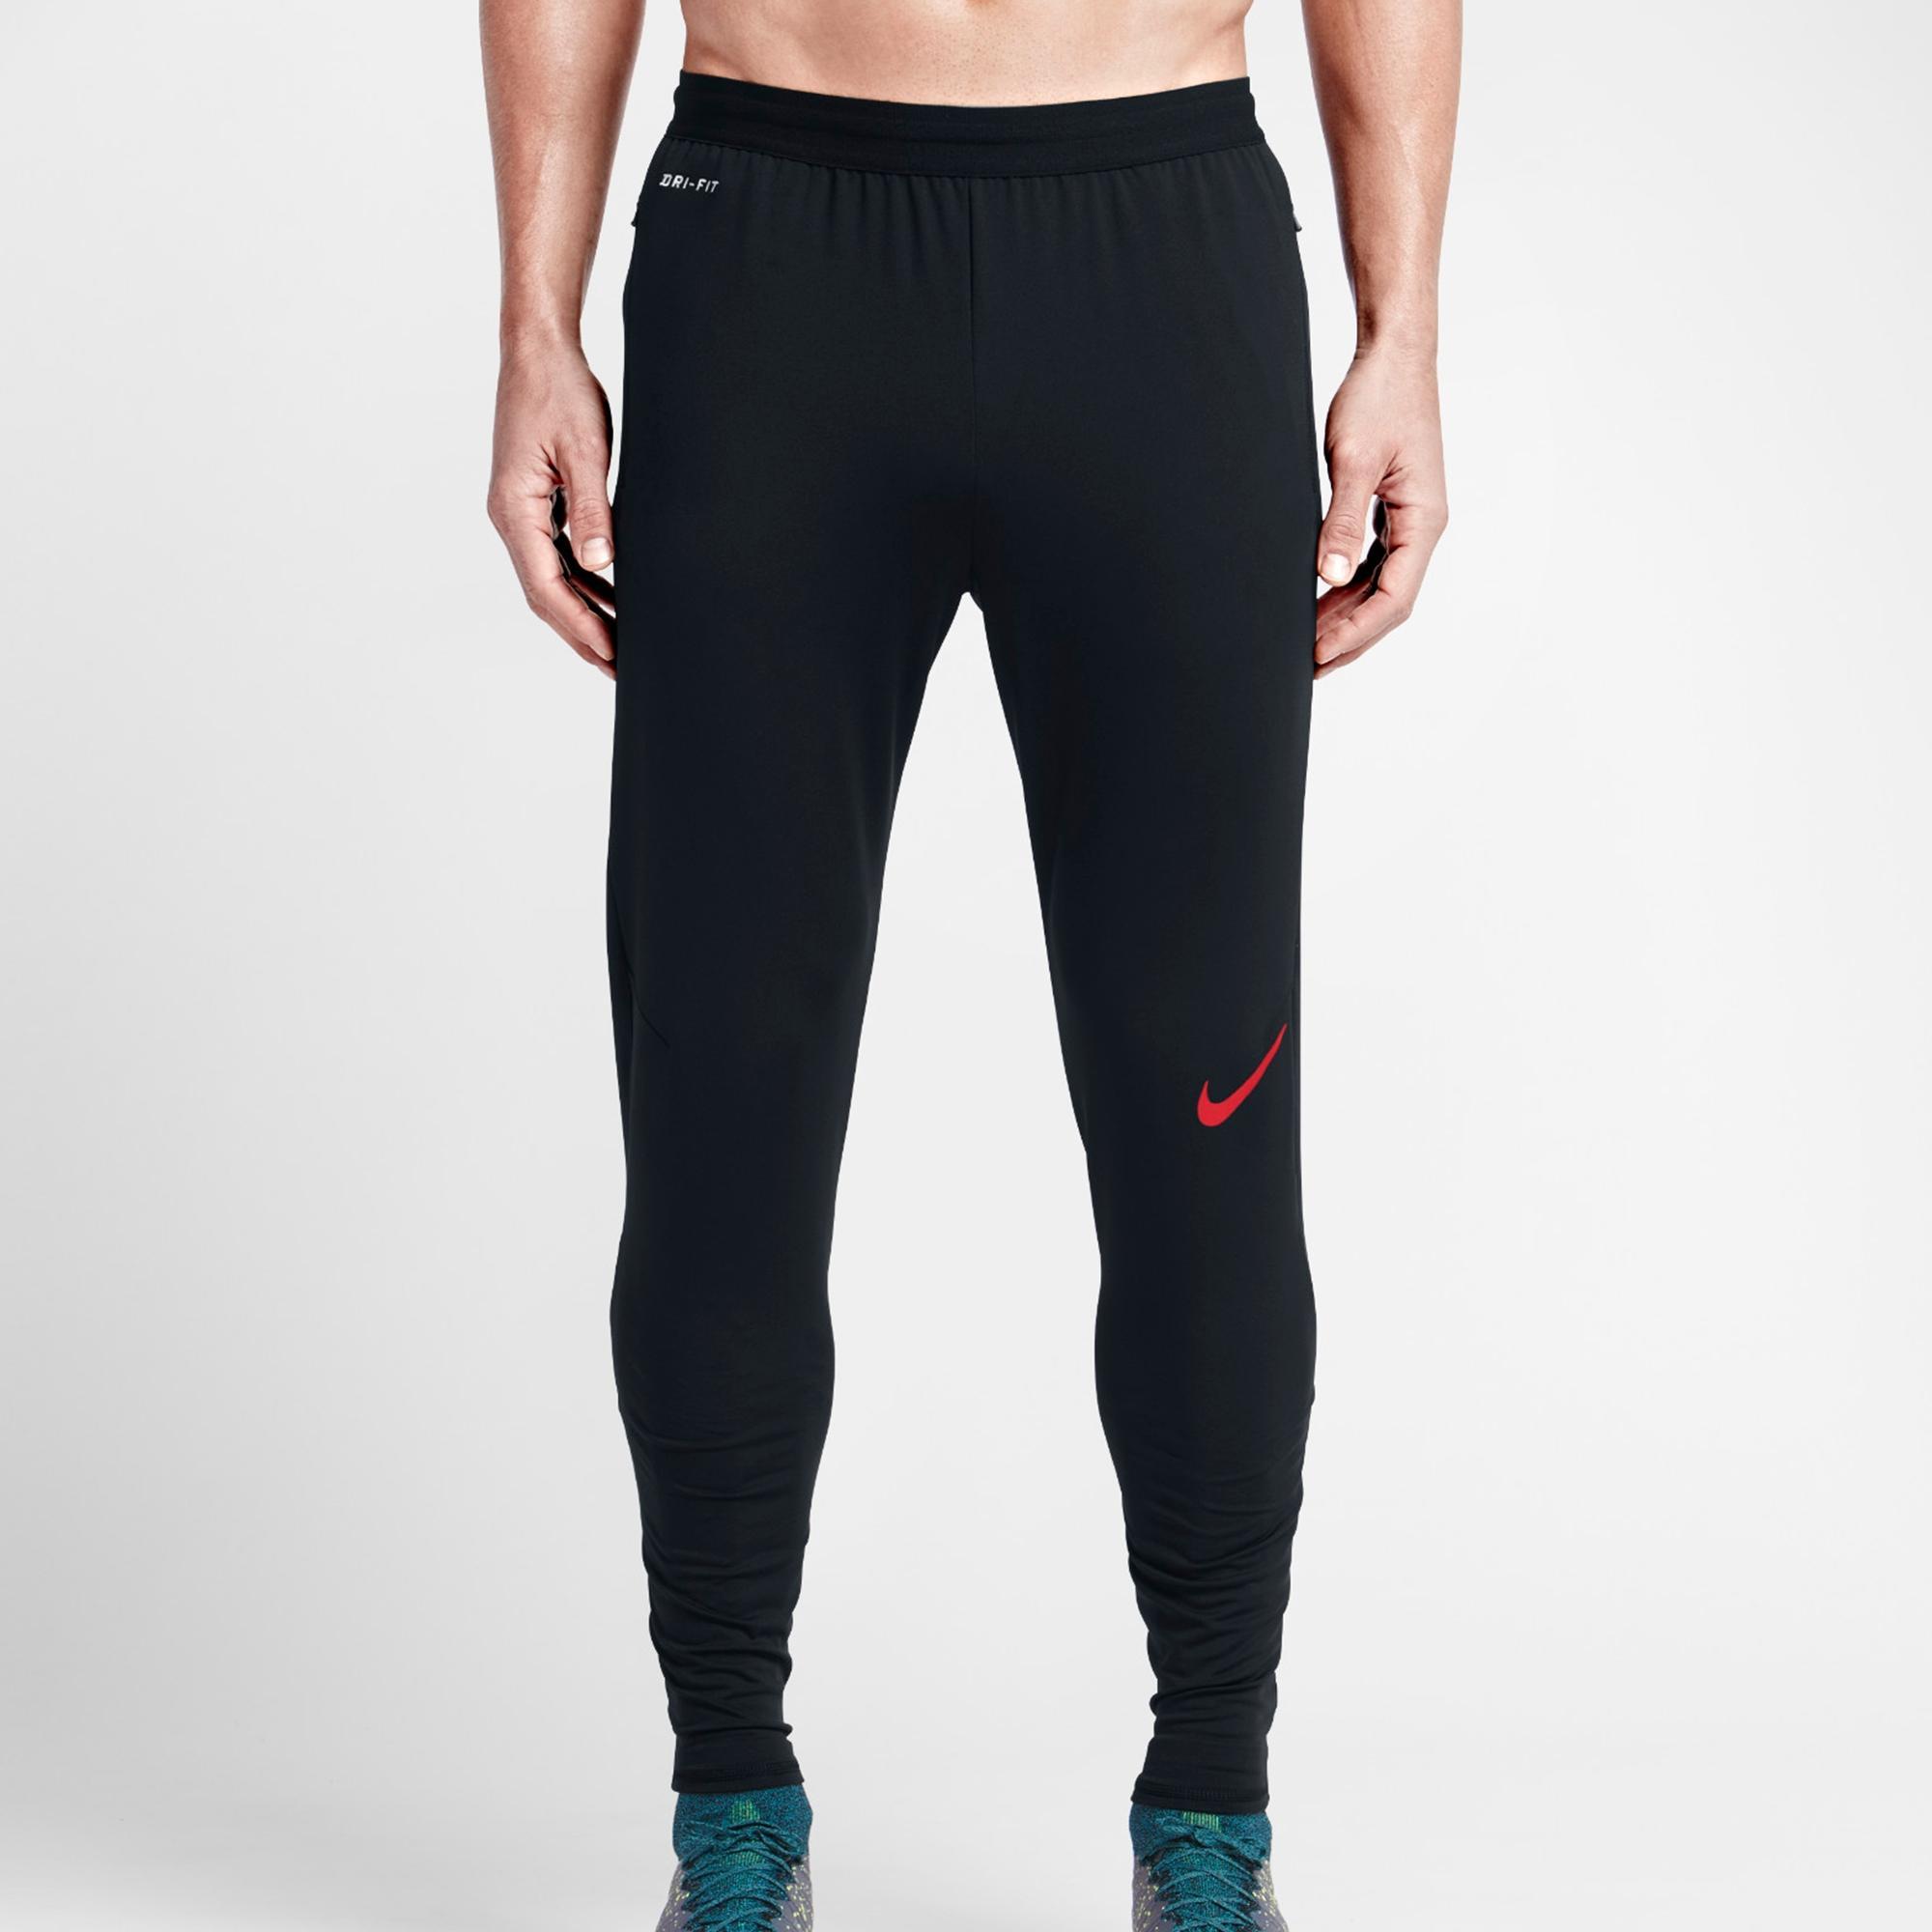 Nike Stretch Tech Men's Soccer Pants FW15 Erkek Tek Alt ...